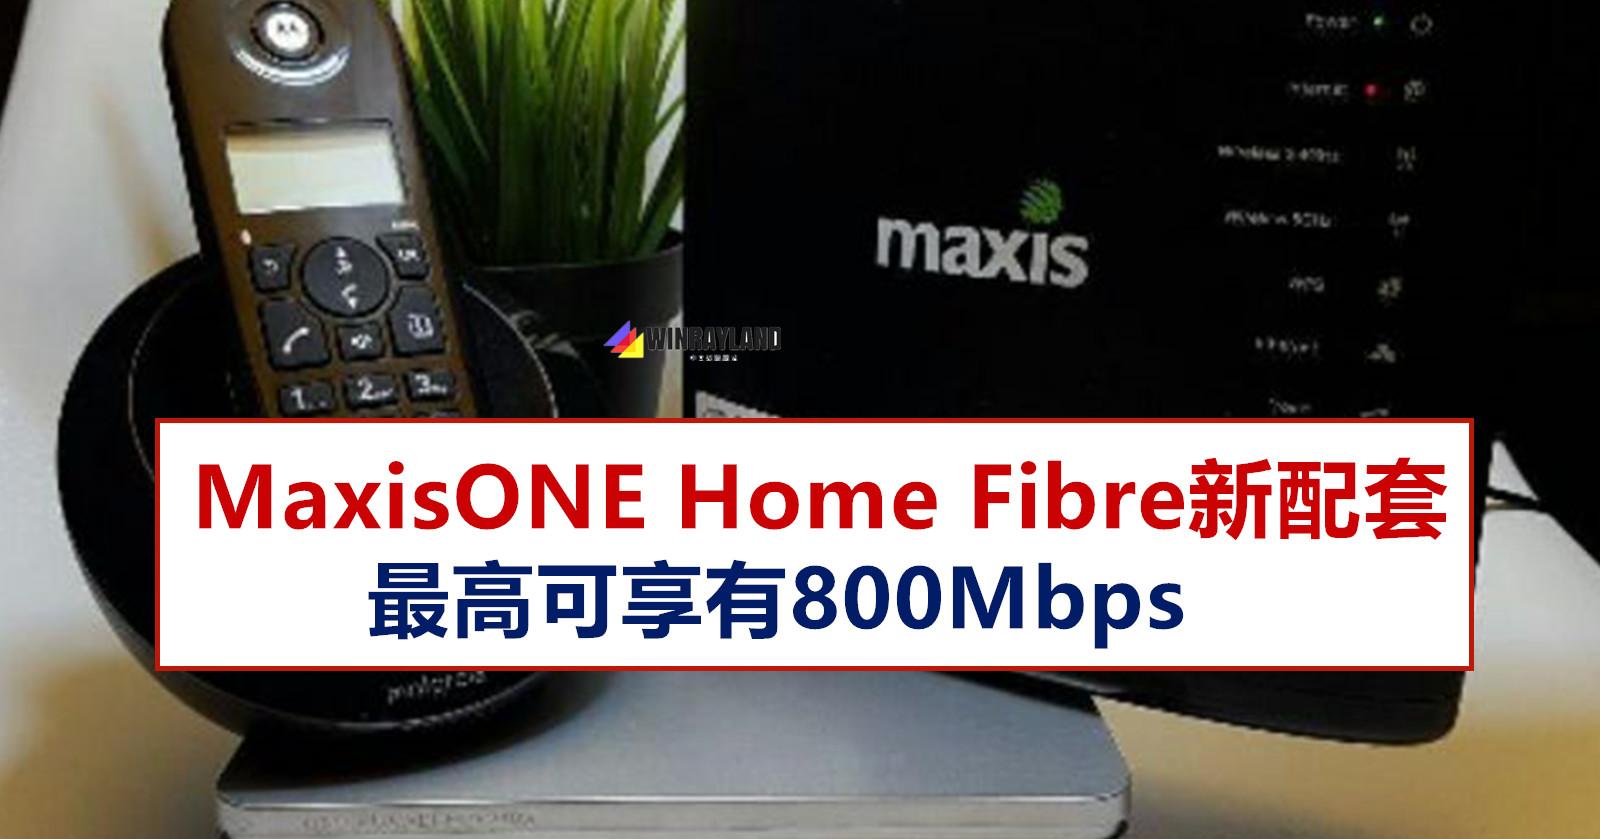 Maxis推出3种家用光纤宽频配套